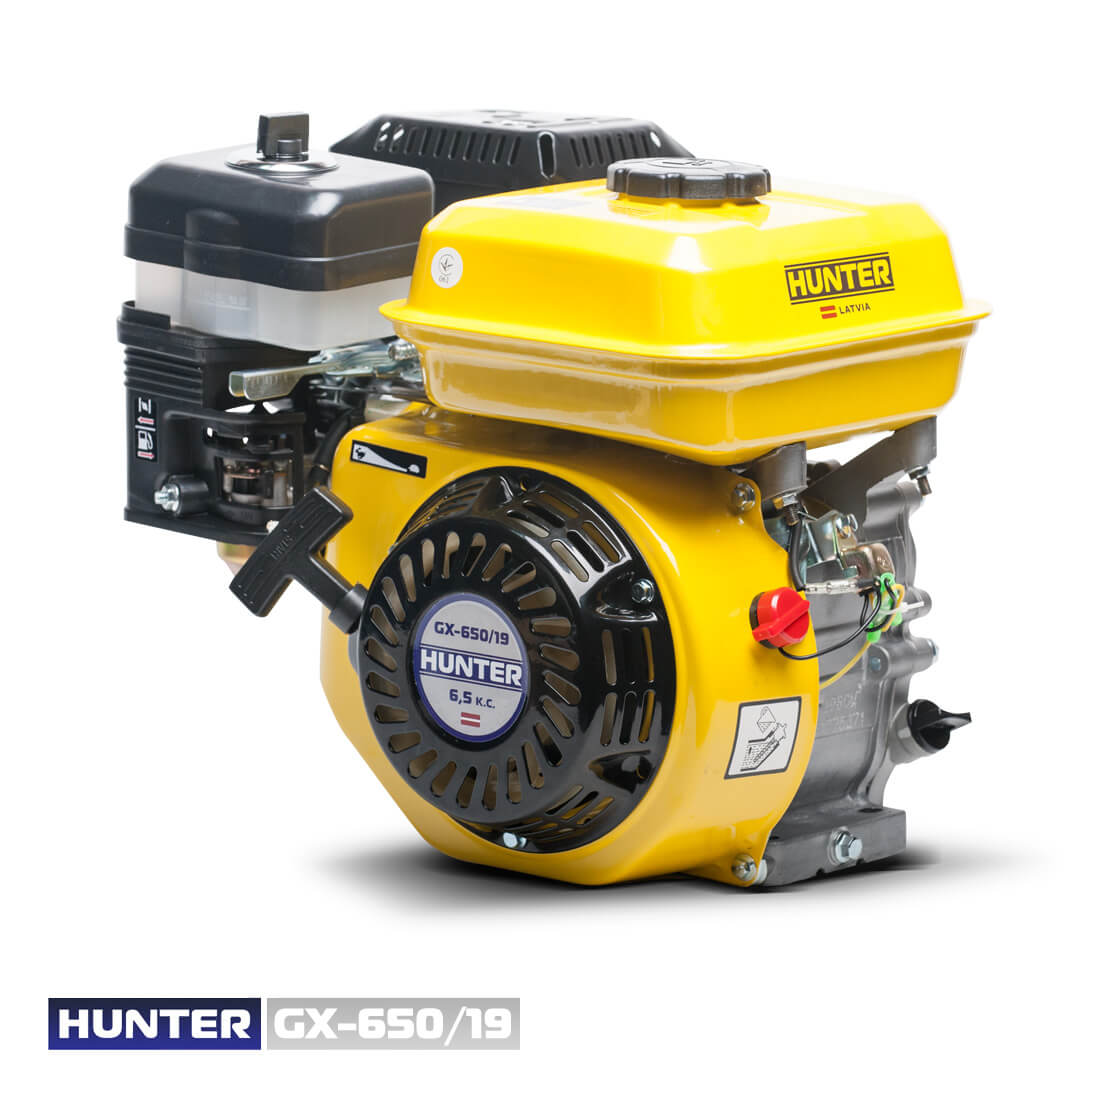 Фото GX-650/19 (шпонка) цена 2950грн №1 — Hunter